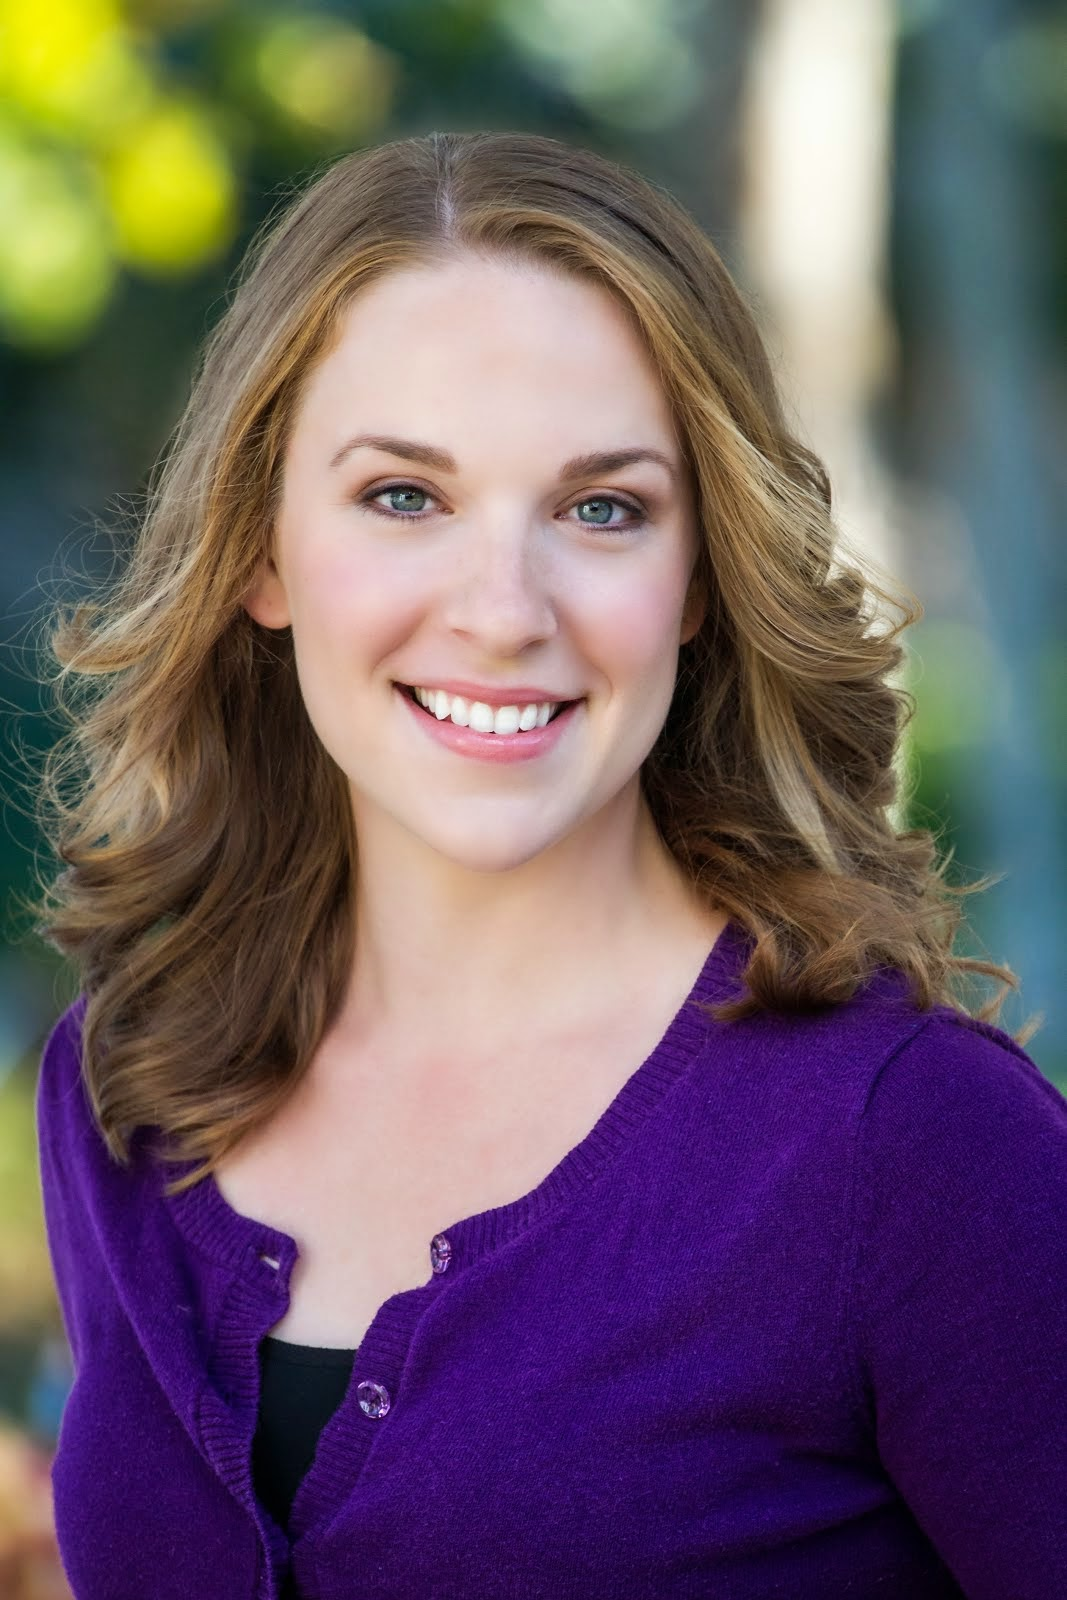 Meet Karissa // The Acting Mom